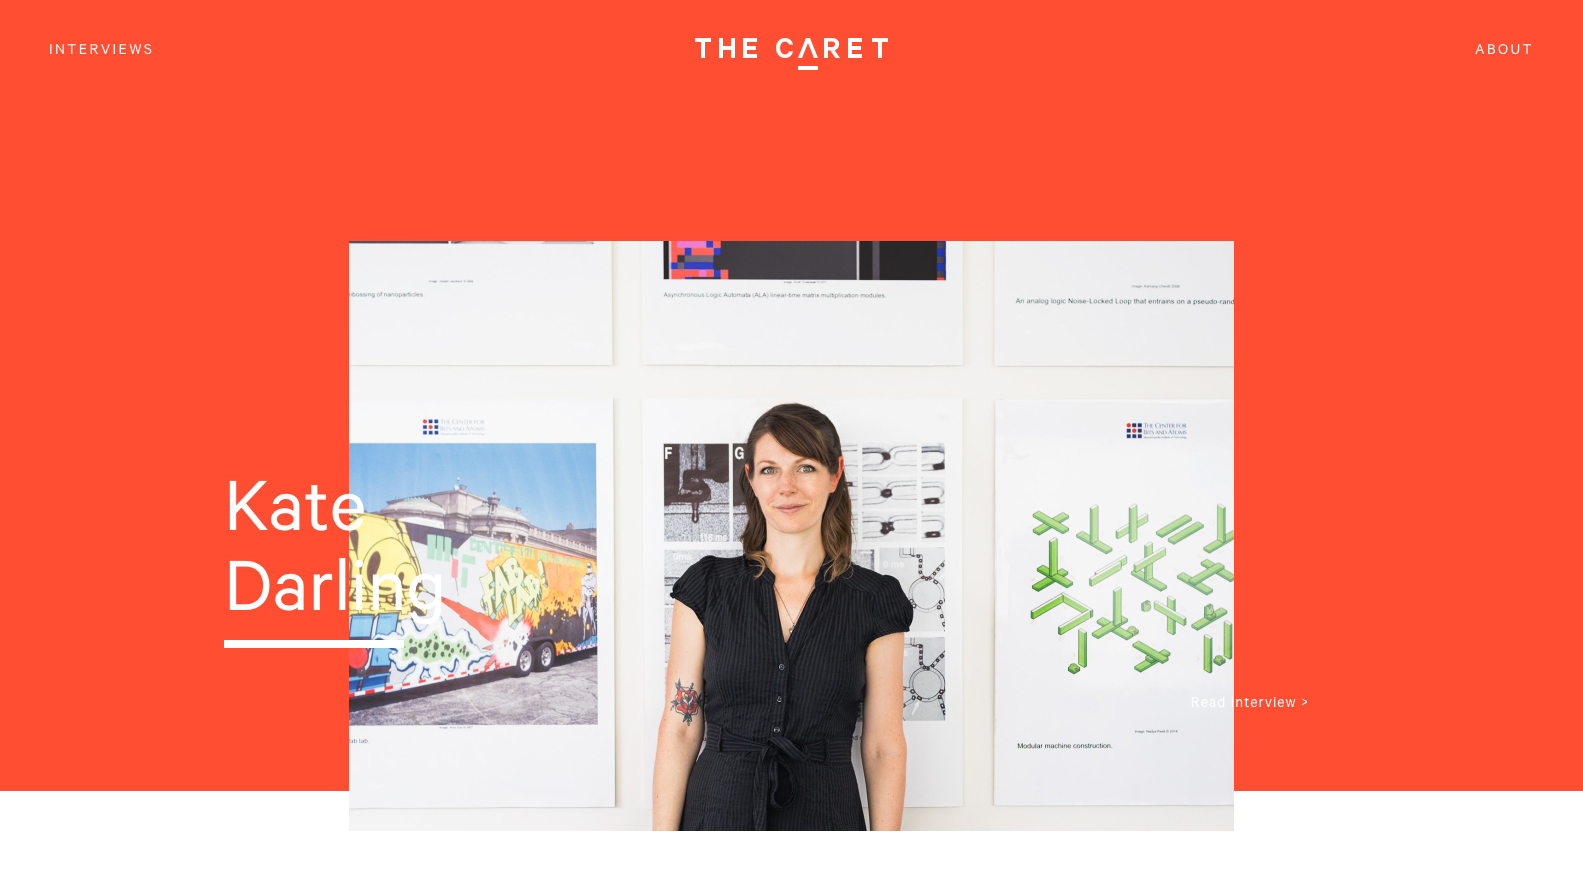 The Caret